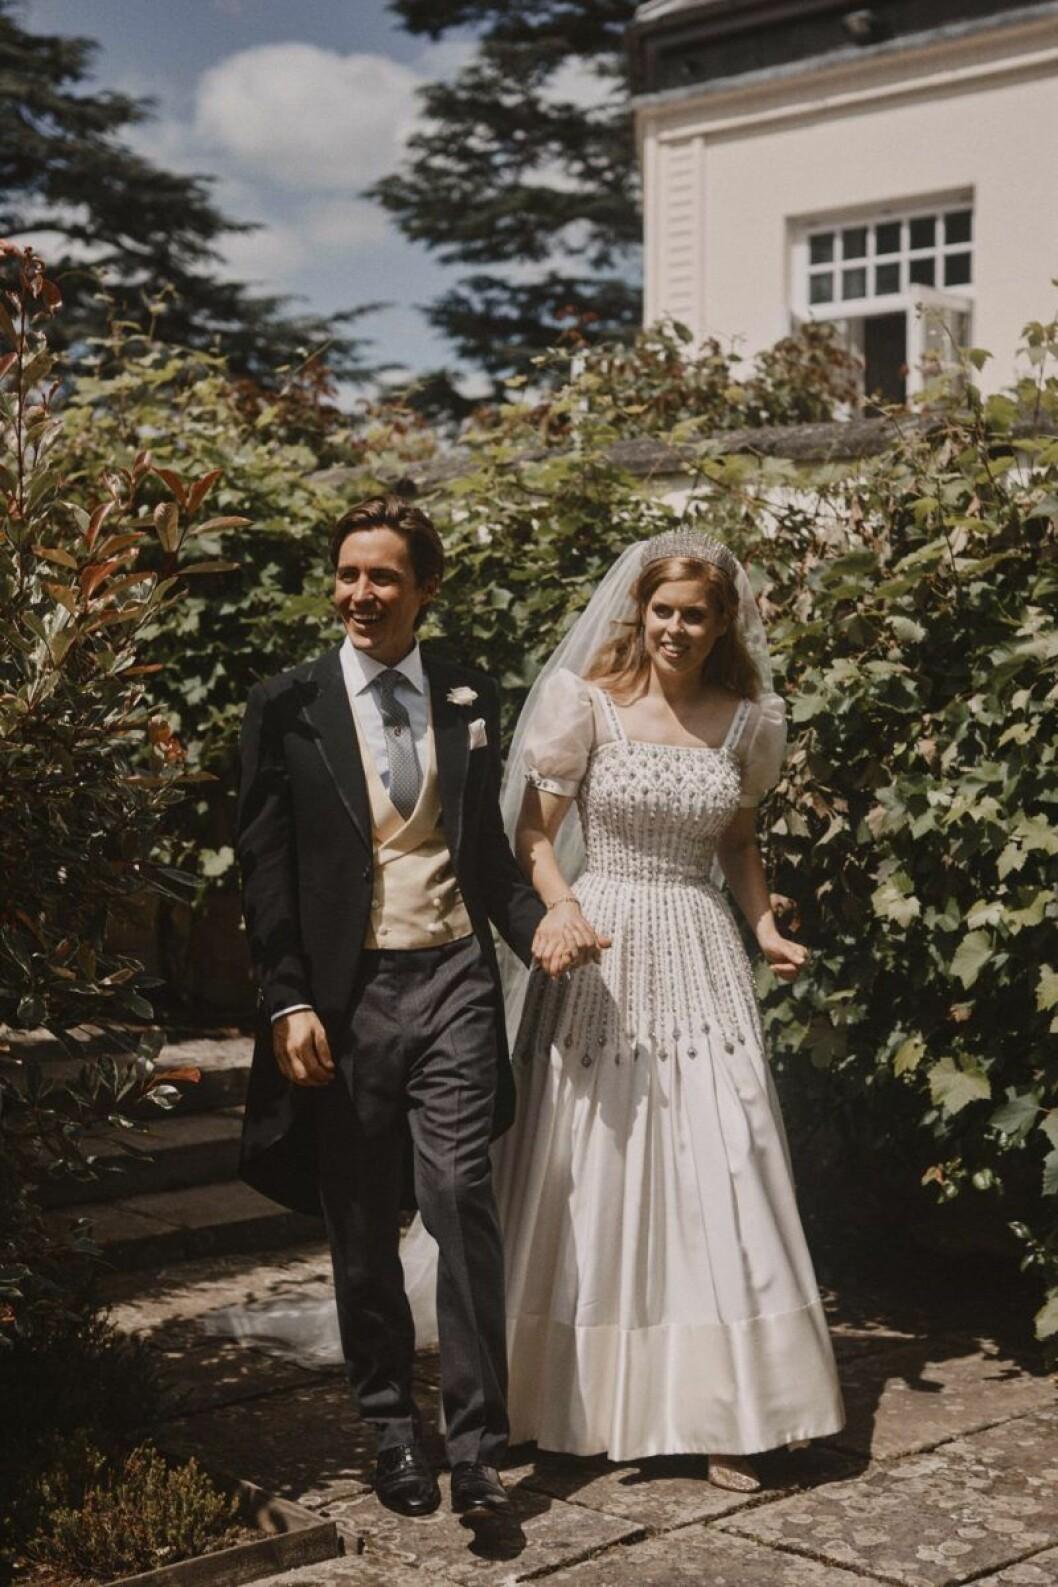 Prinsessan Beatrixe och Edoardo Mapelli Mozzi gifter sig i Windsor